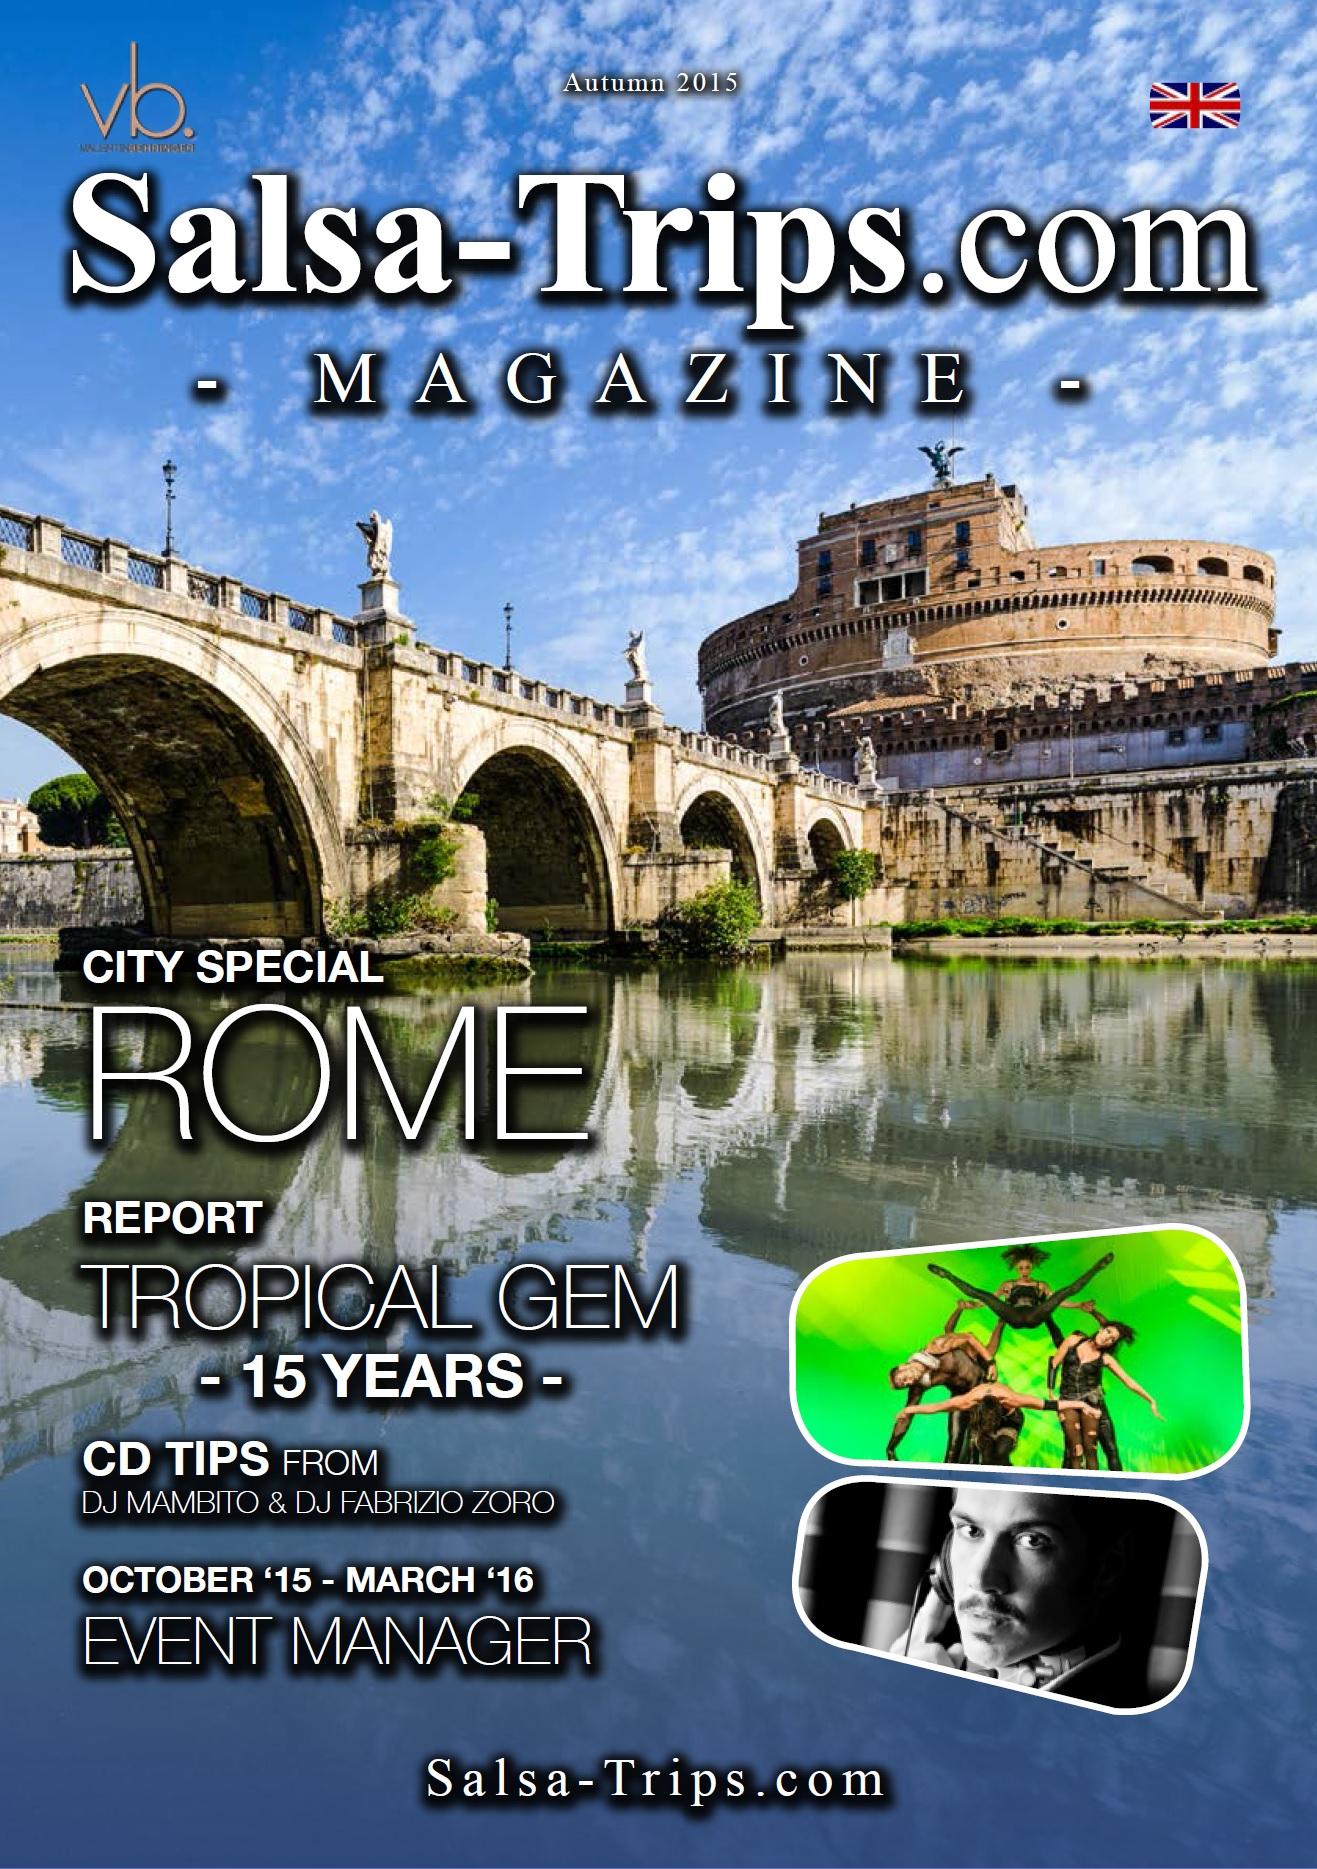 Salsa-Trips.com Magazine Summer 2015